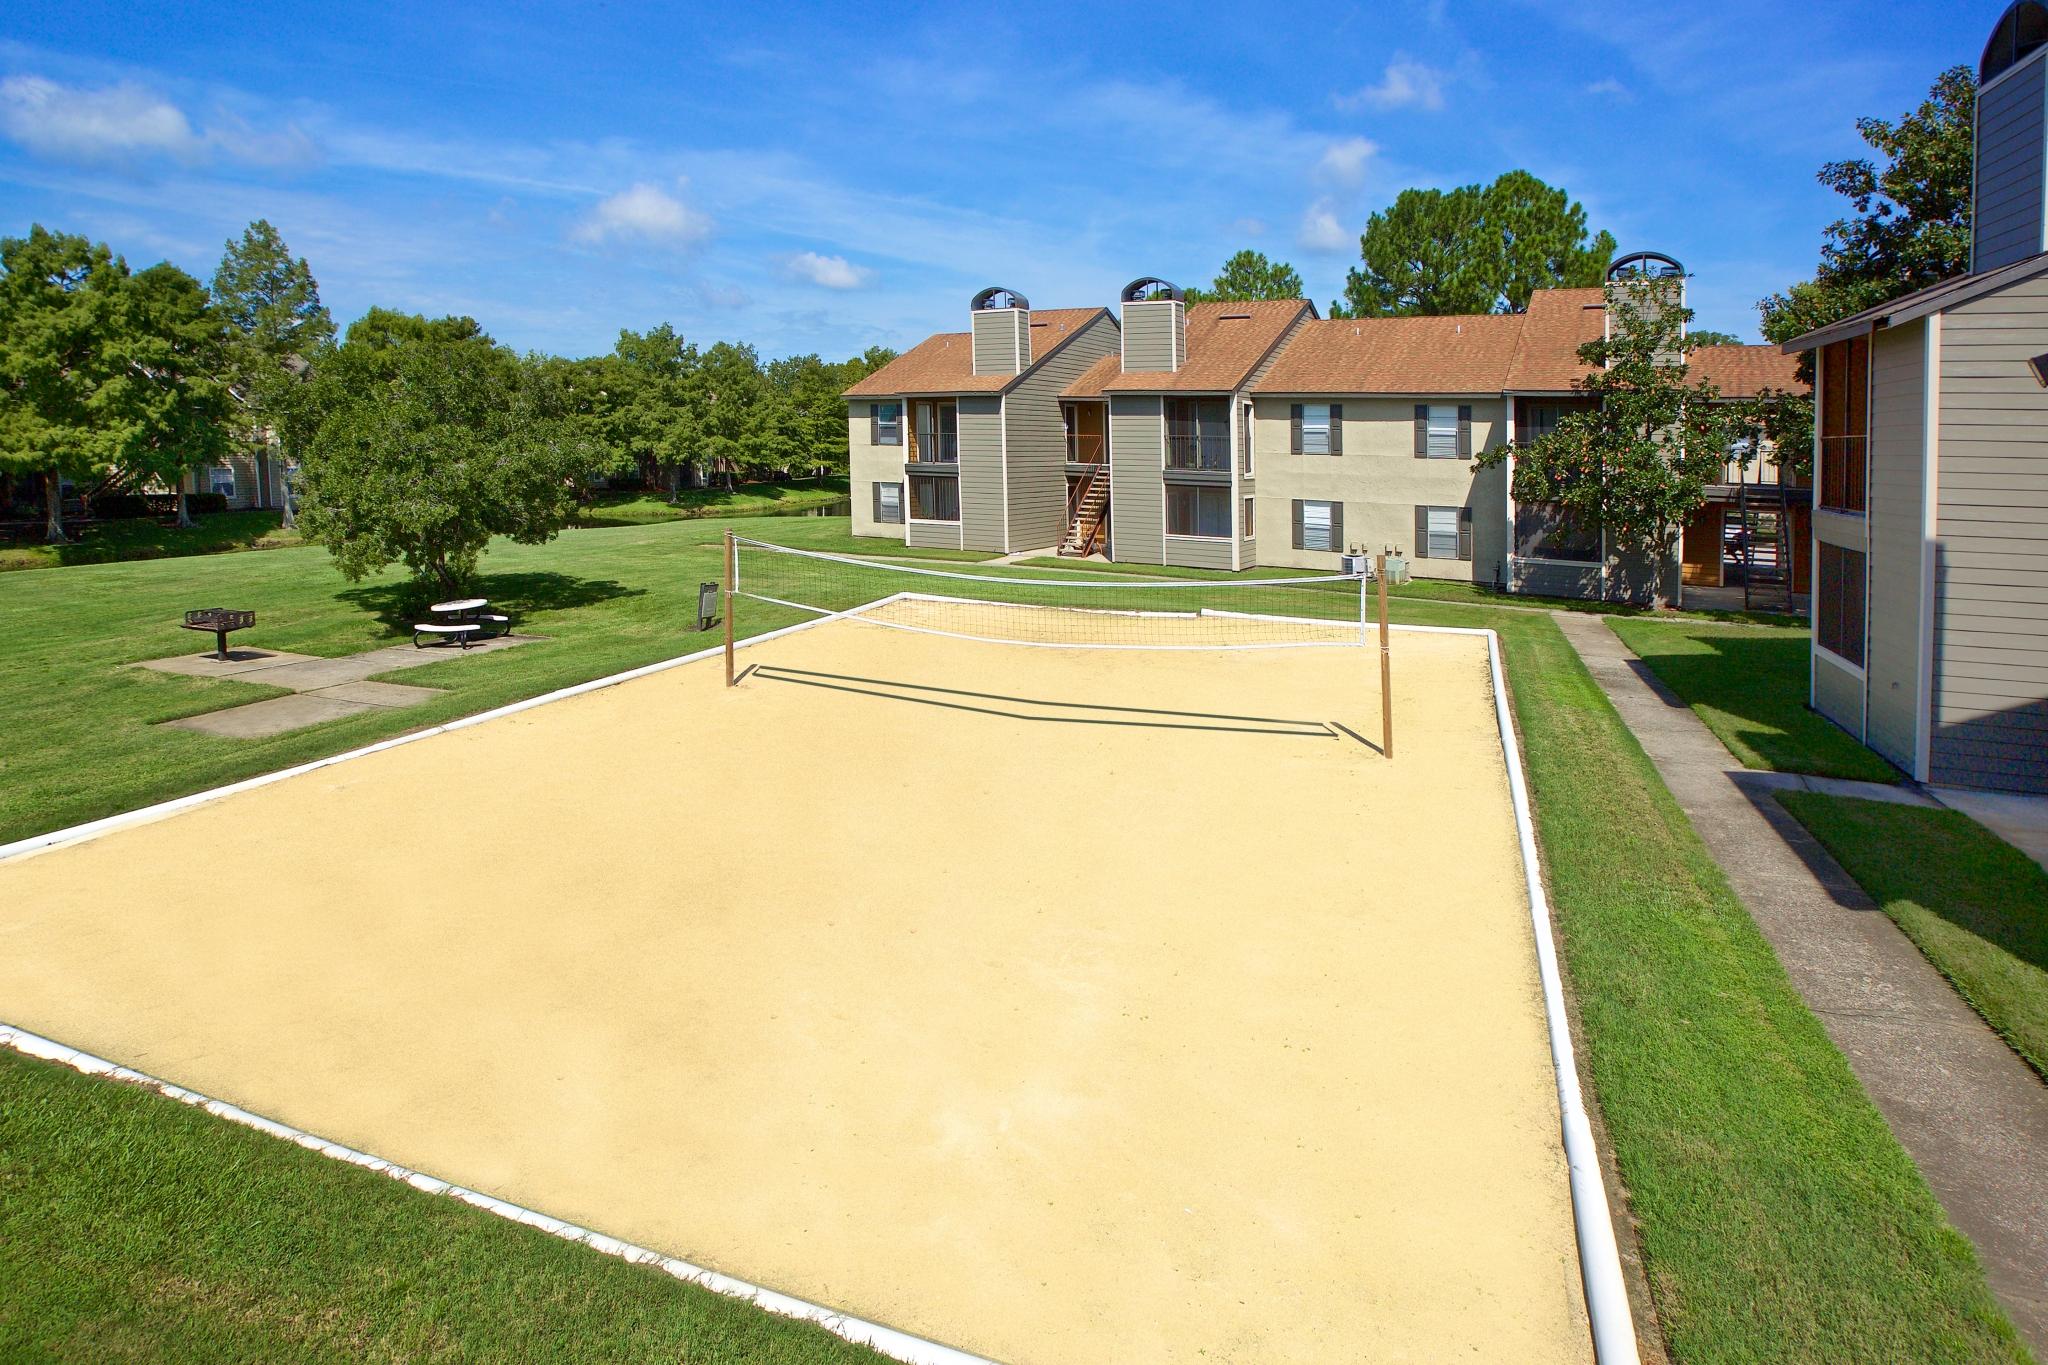 bentley green apartments for rent in jacksonville fl milestone